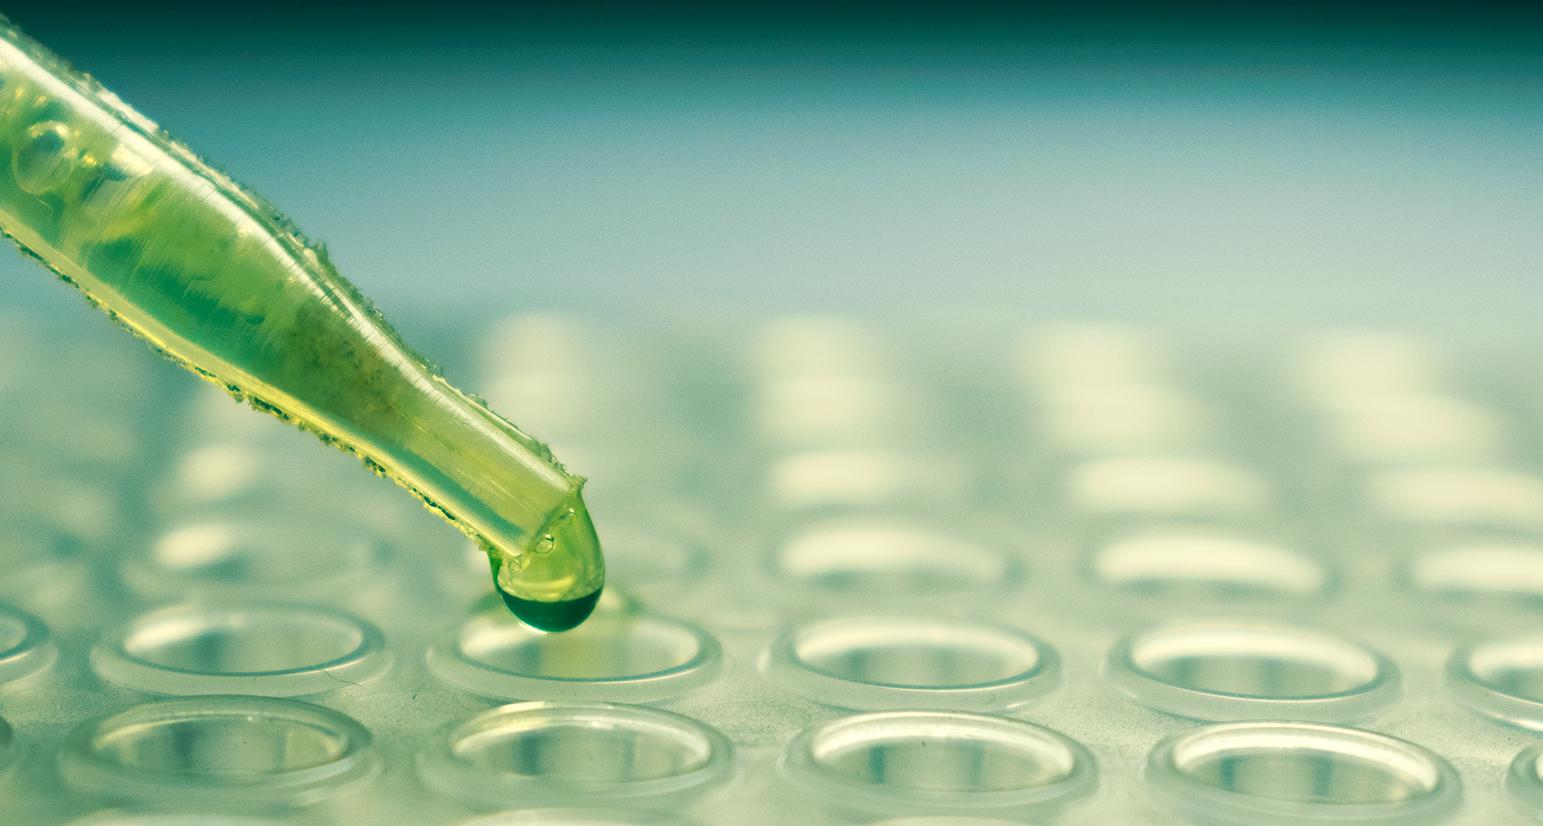 Process Raman for Biopharma